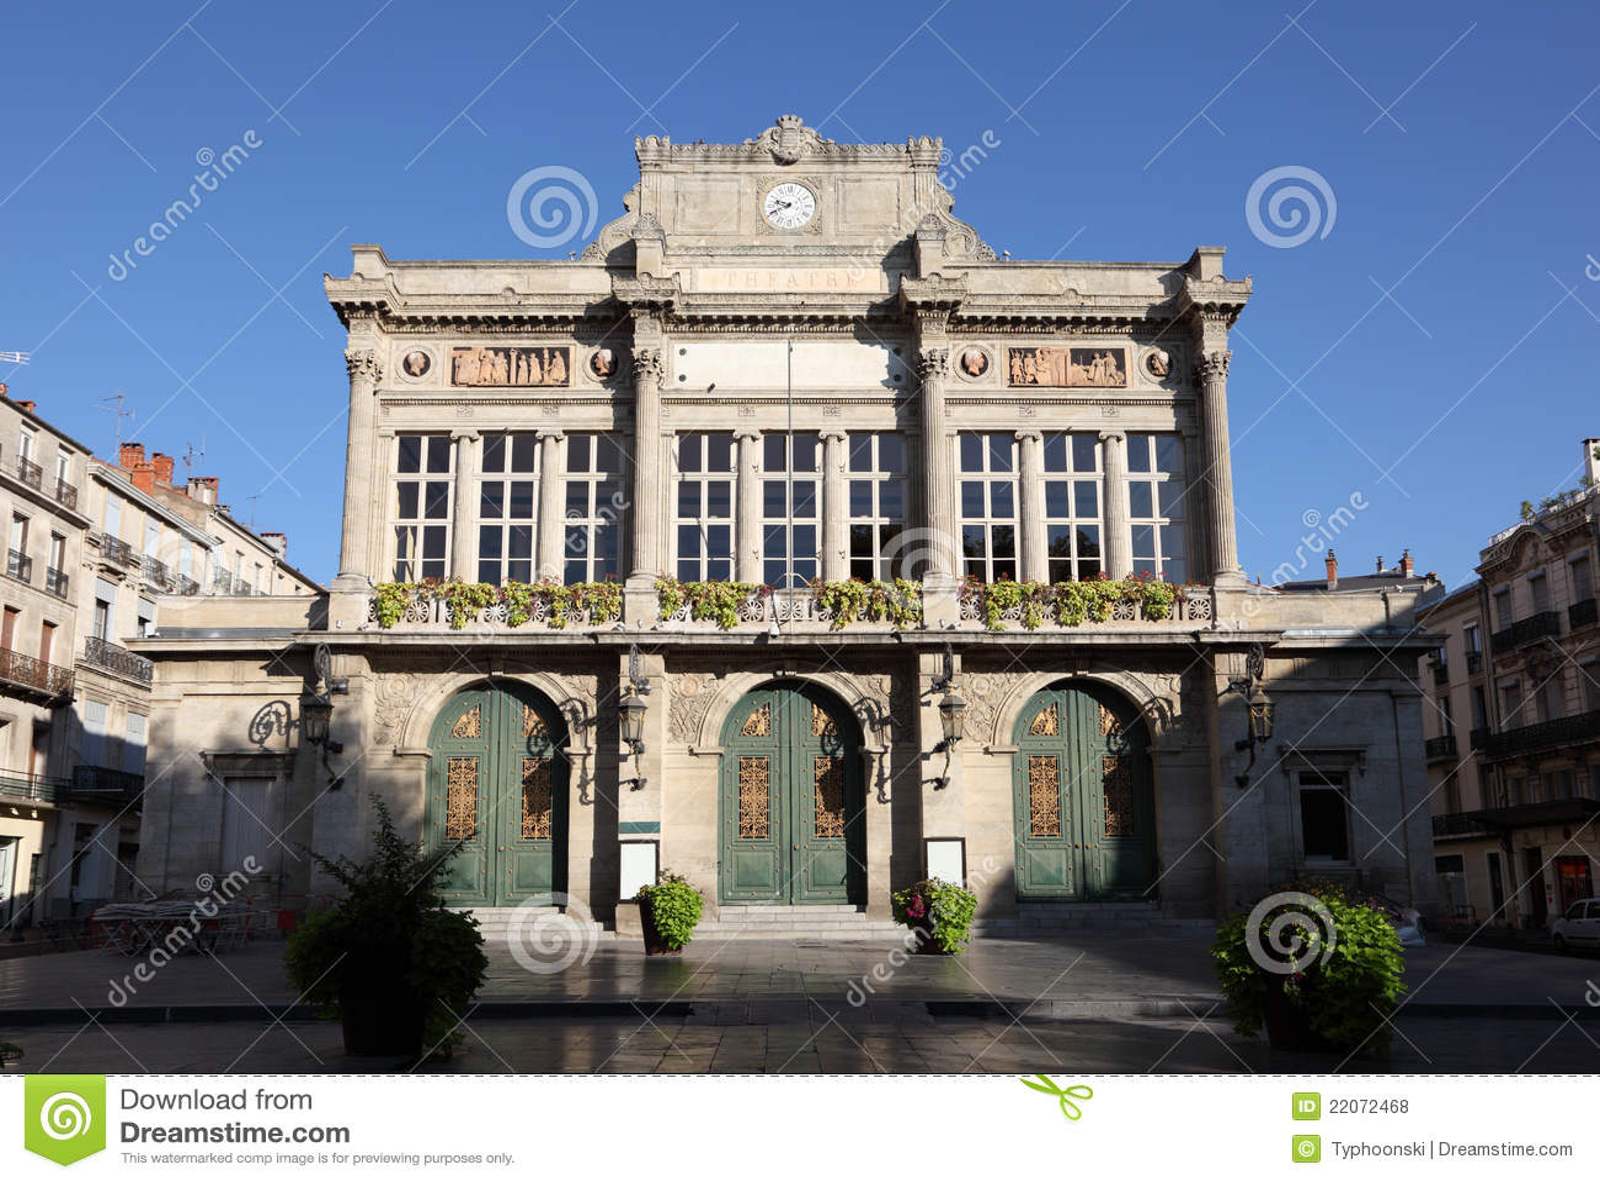 teatro municipal en beziers francia fotos de archivo libres de regal as imagen 22072468. Black Bedroom Furniture Sets. Home Design Ideas